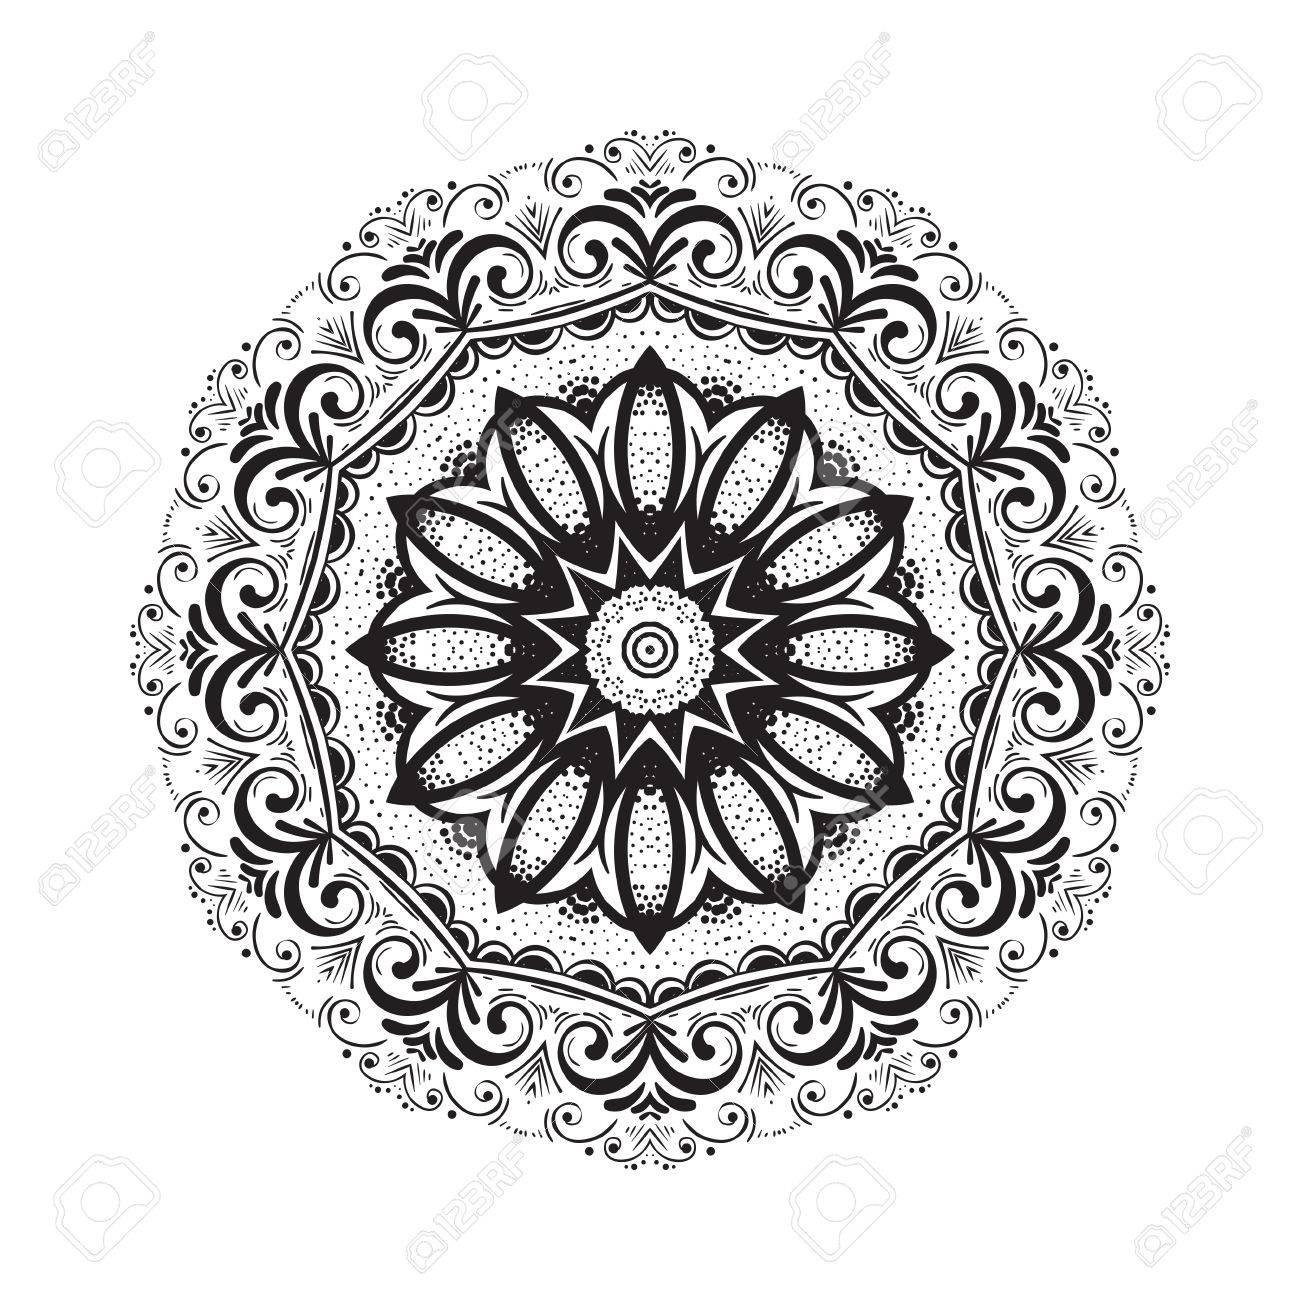 1300x1300 Hand Drawn Mandala Henna Pattern. Can Be Used